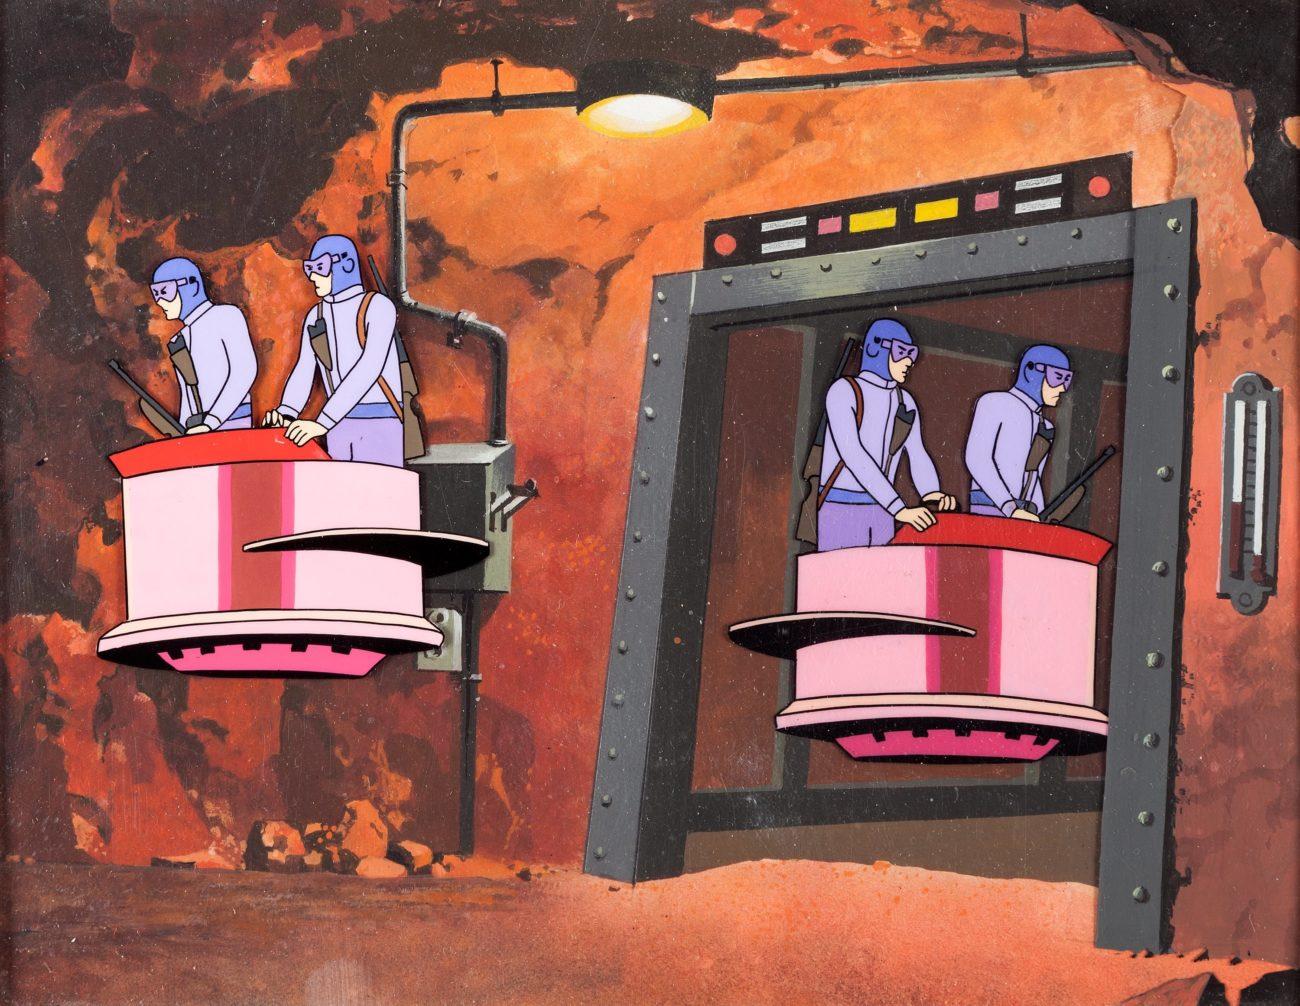 Jonny Quest (1964) animation cell & background - Dangerous ...